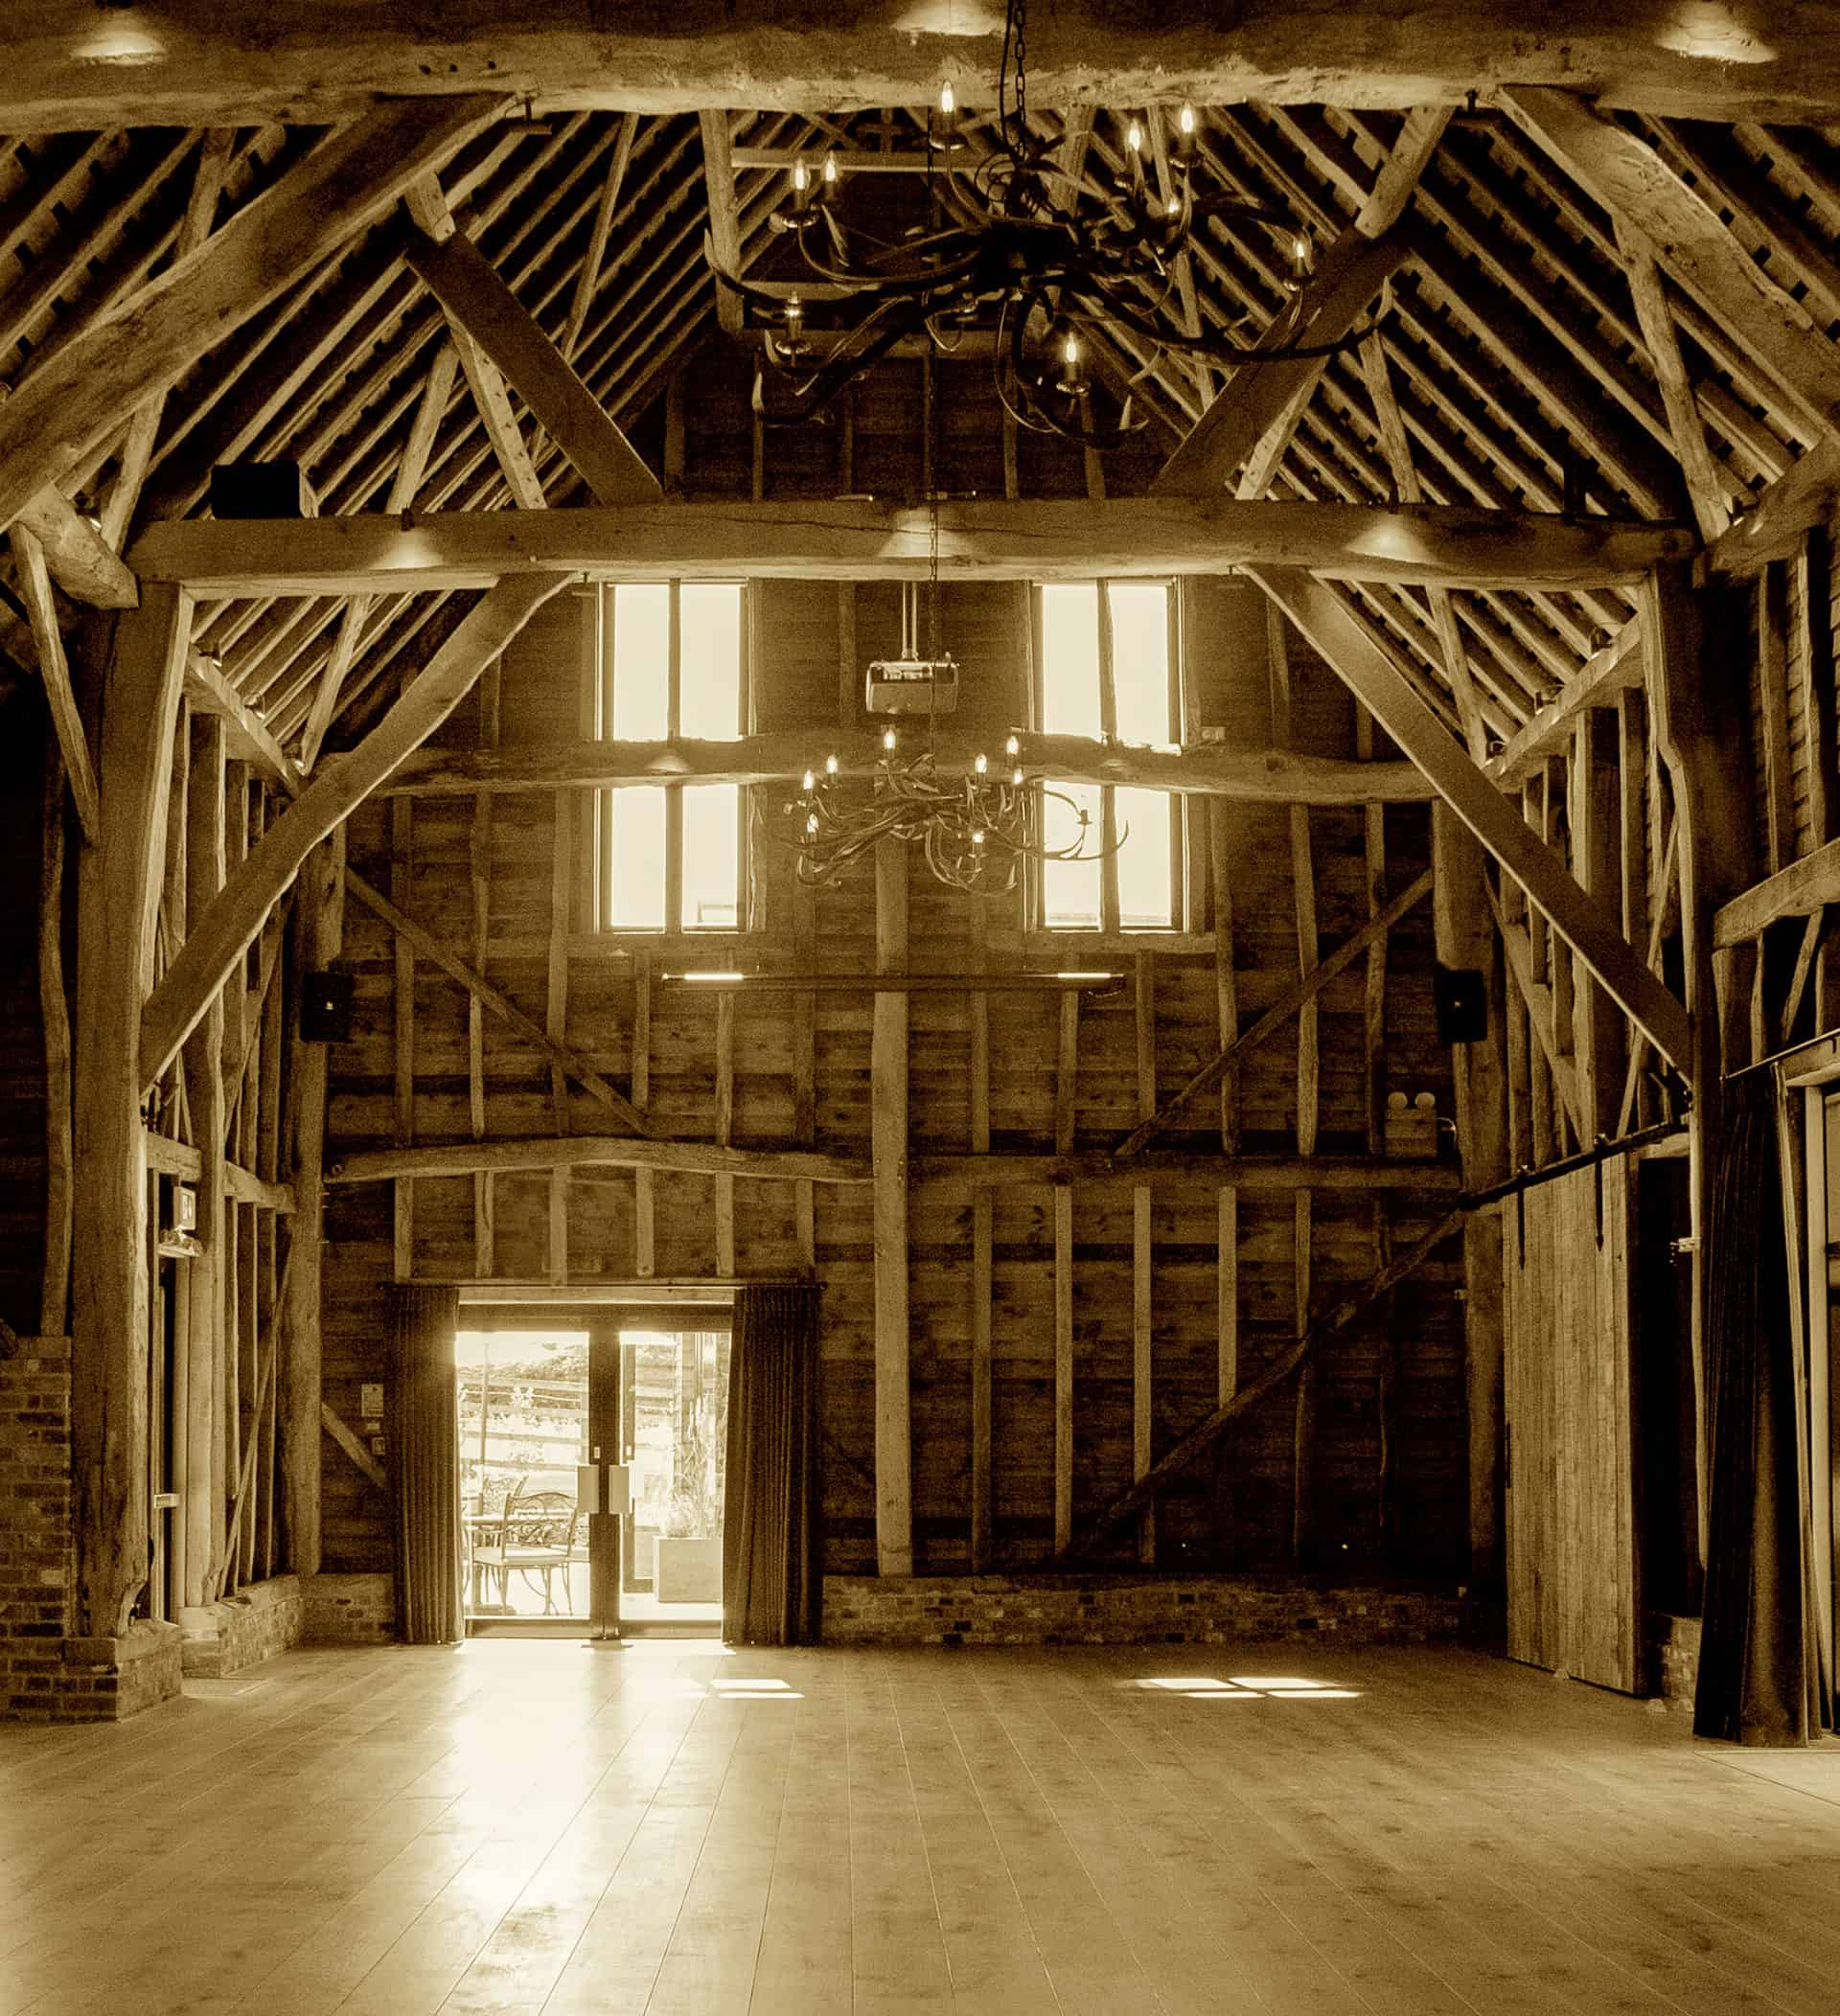 Mnp Redcoats Barns.457.1